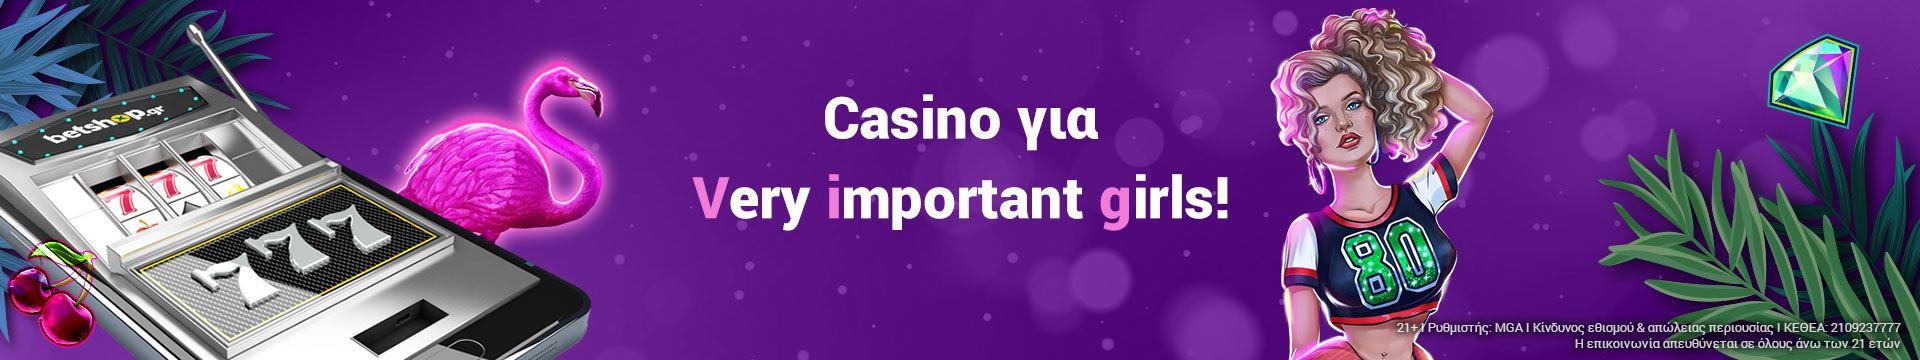 Casino για Very important girls!